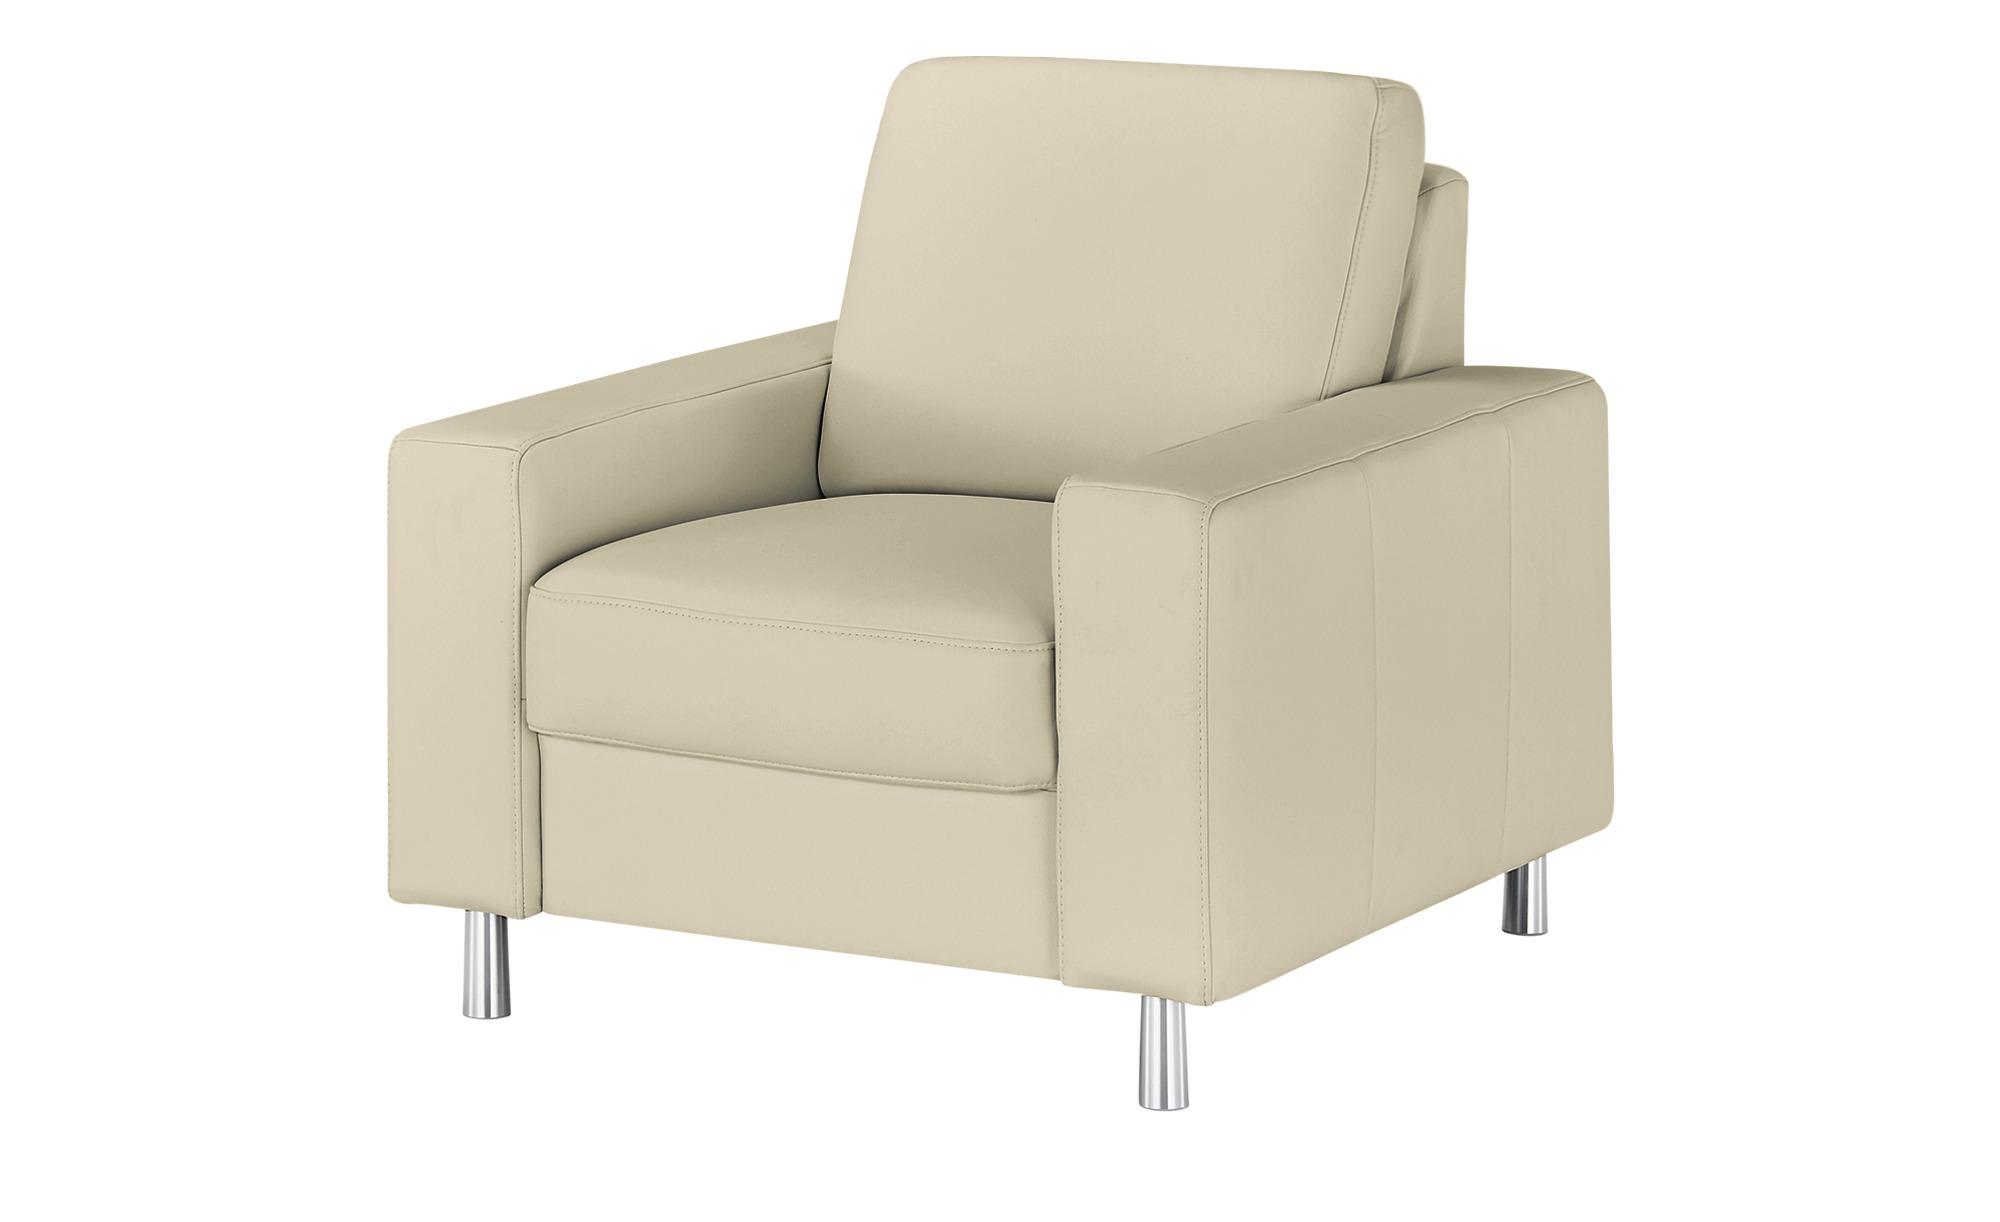 meinSofa Sessel  Byron ¦ grau ¦ Maße (cm): B: 88 H: 86 T: 95 Polstermöbel > Sessel > Ledersessel - Höffner